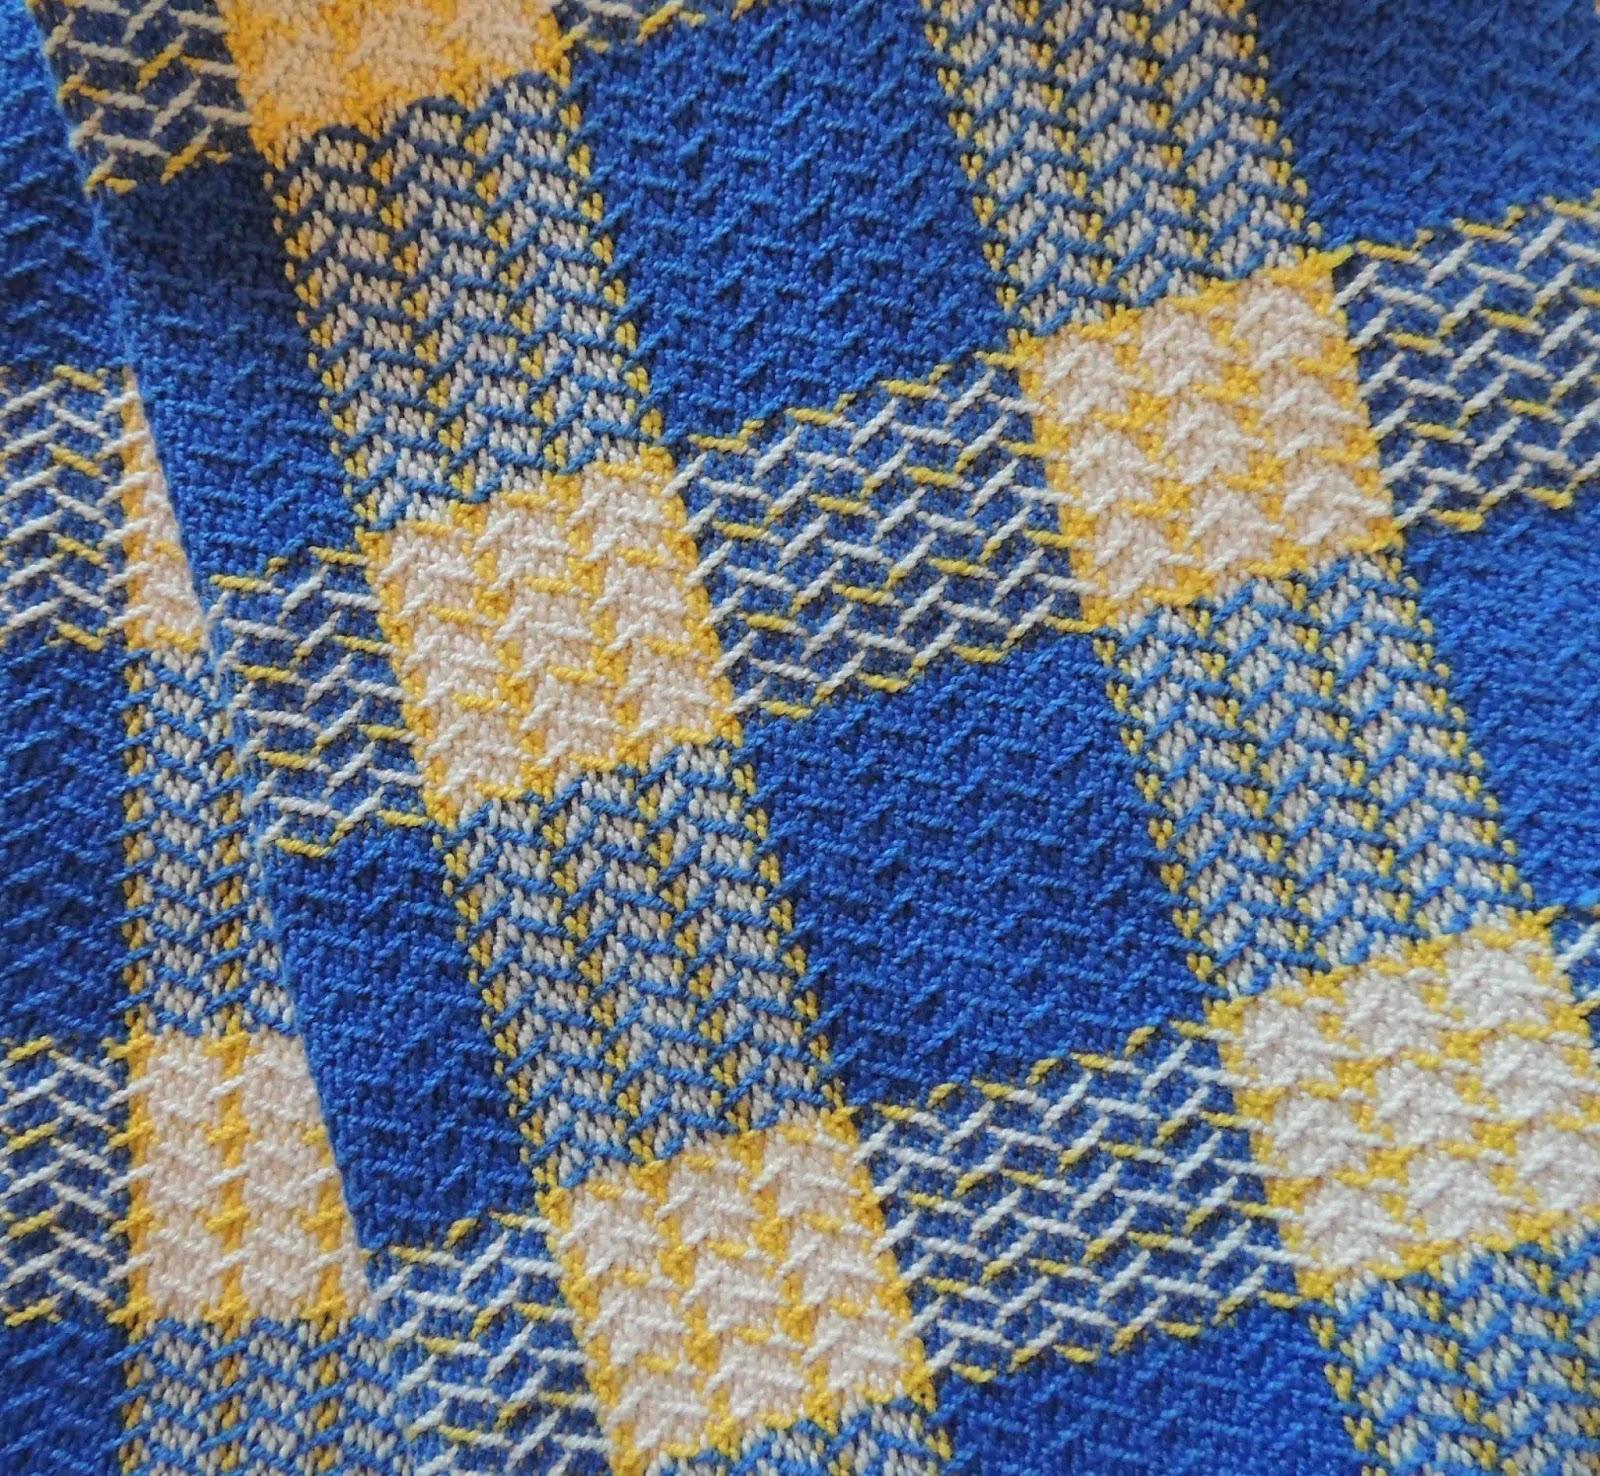 Gym Junkie Towel: Reno Fiber Guild: Even More Handwoven Towels